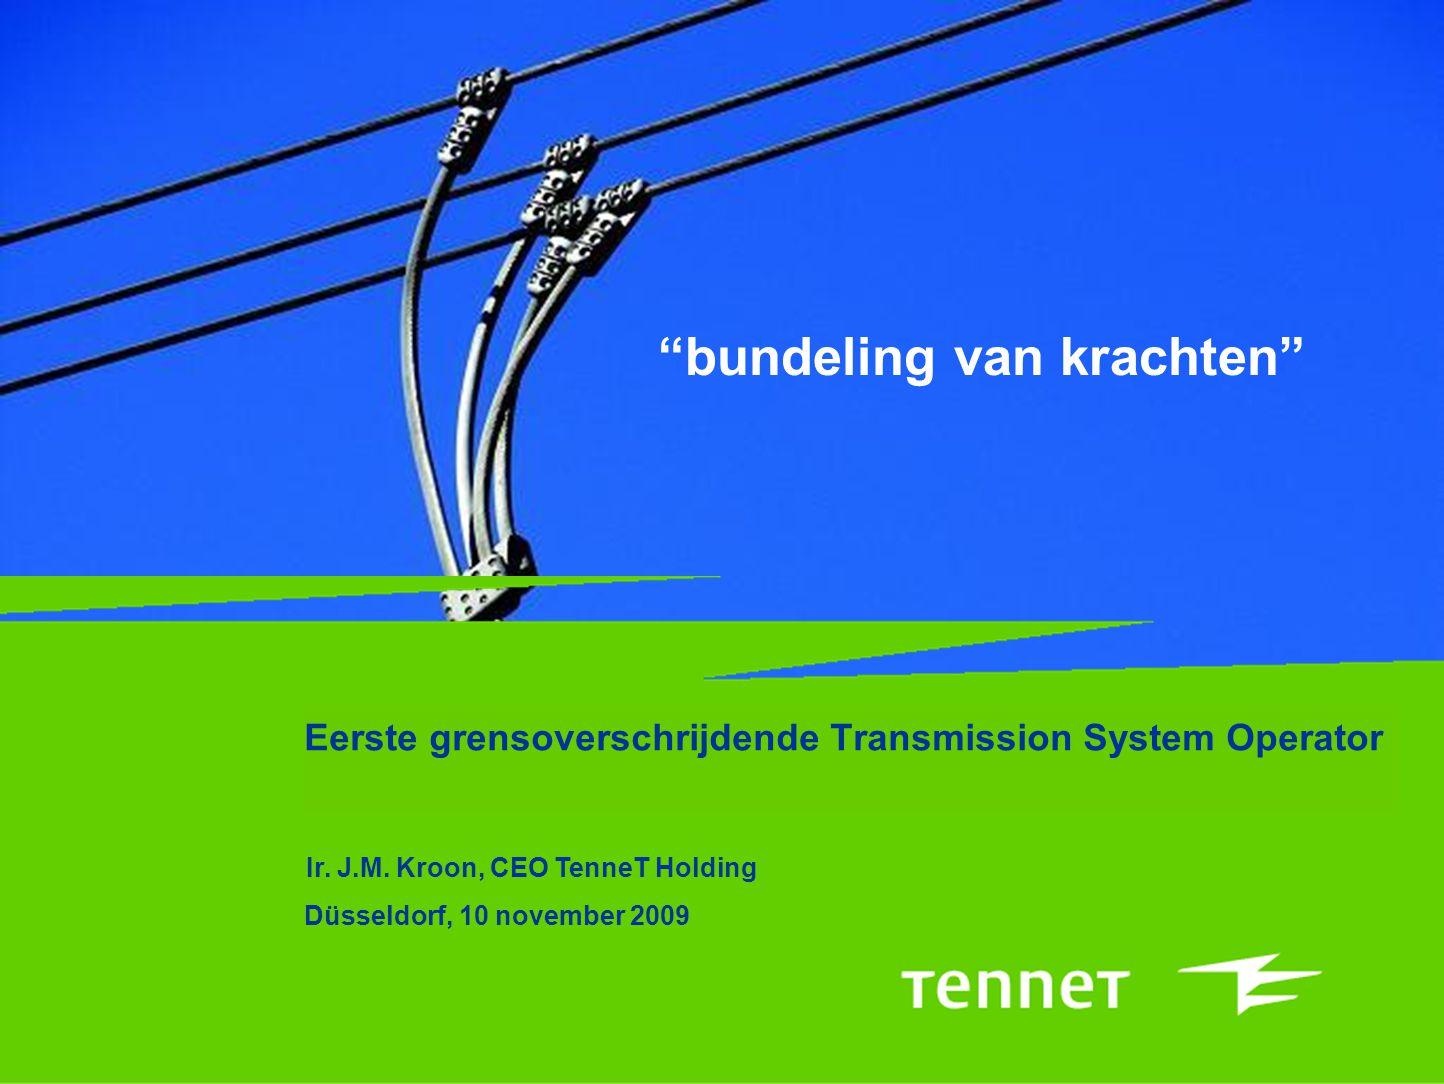 bundeling van krachten Eerste grensoverschrijdende Transmission System Operator Ir.